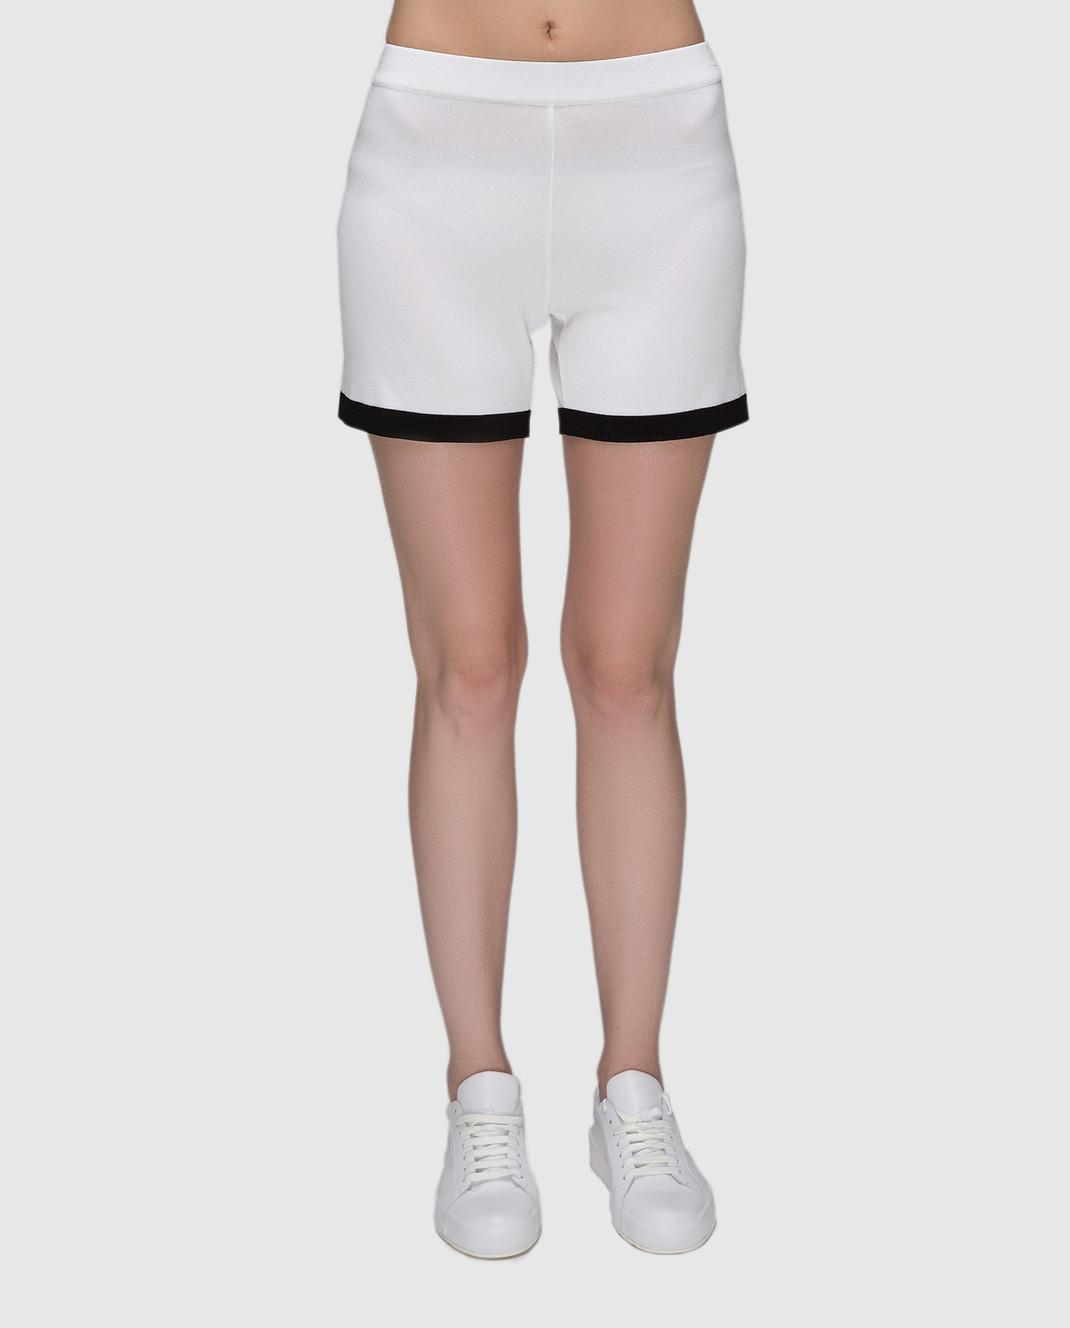 Tsarevna Белые шорты TS0102 изображение 3